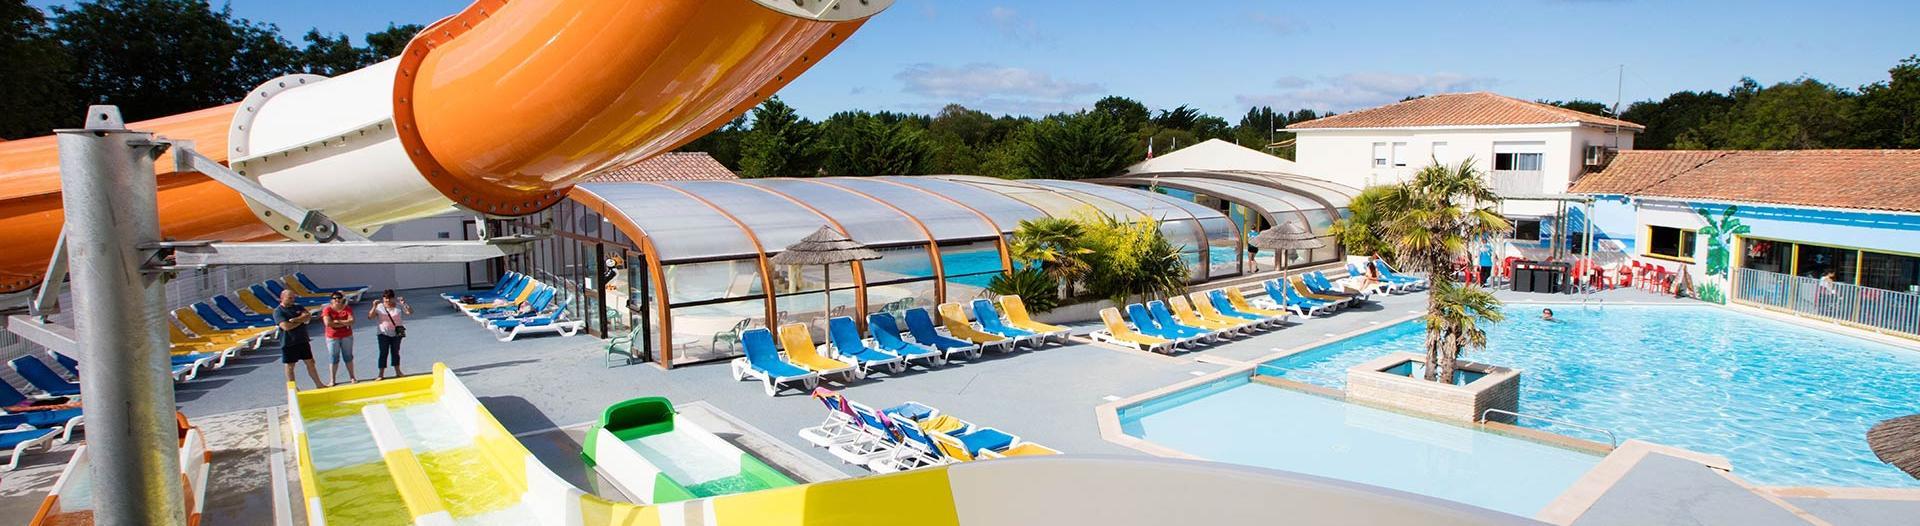 slider-piscine-et-toboggans-oleron-loisirs